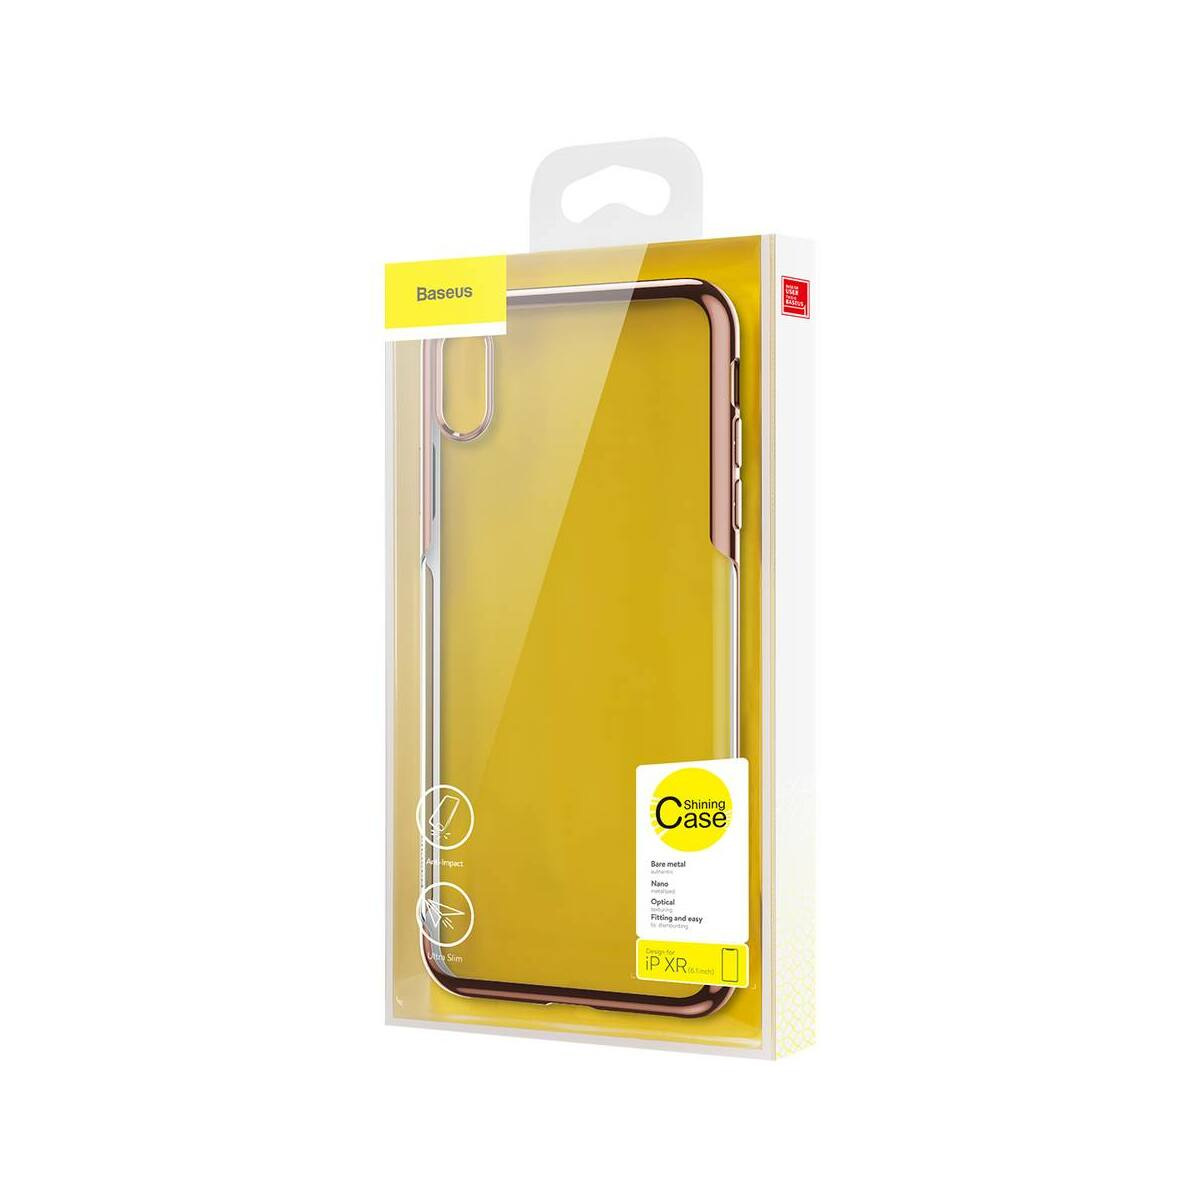 Baseus iPhone XR tok, Shining, arany (ARAPIPH61-MD0V)